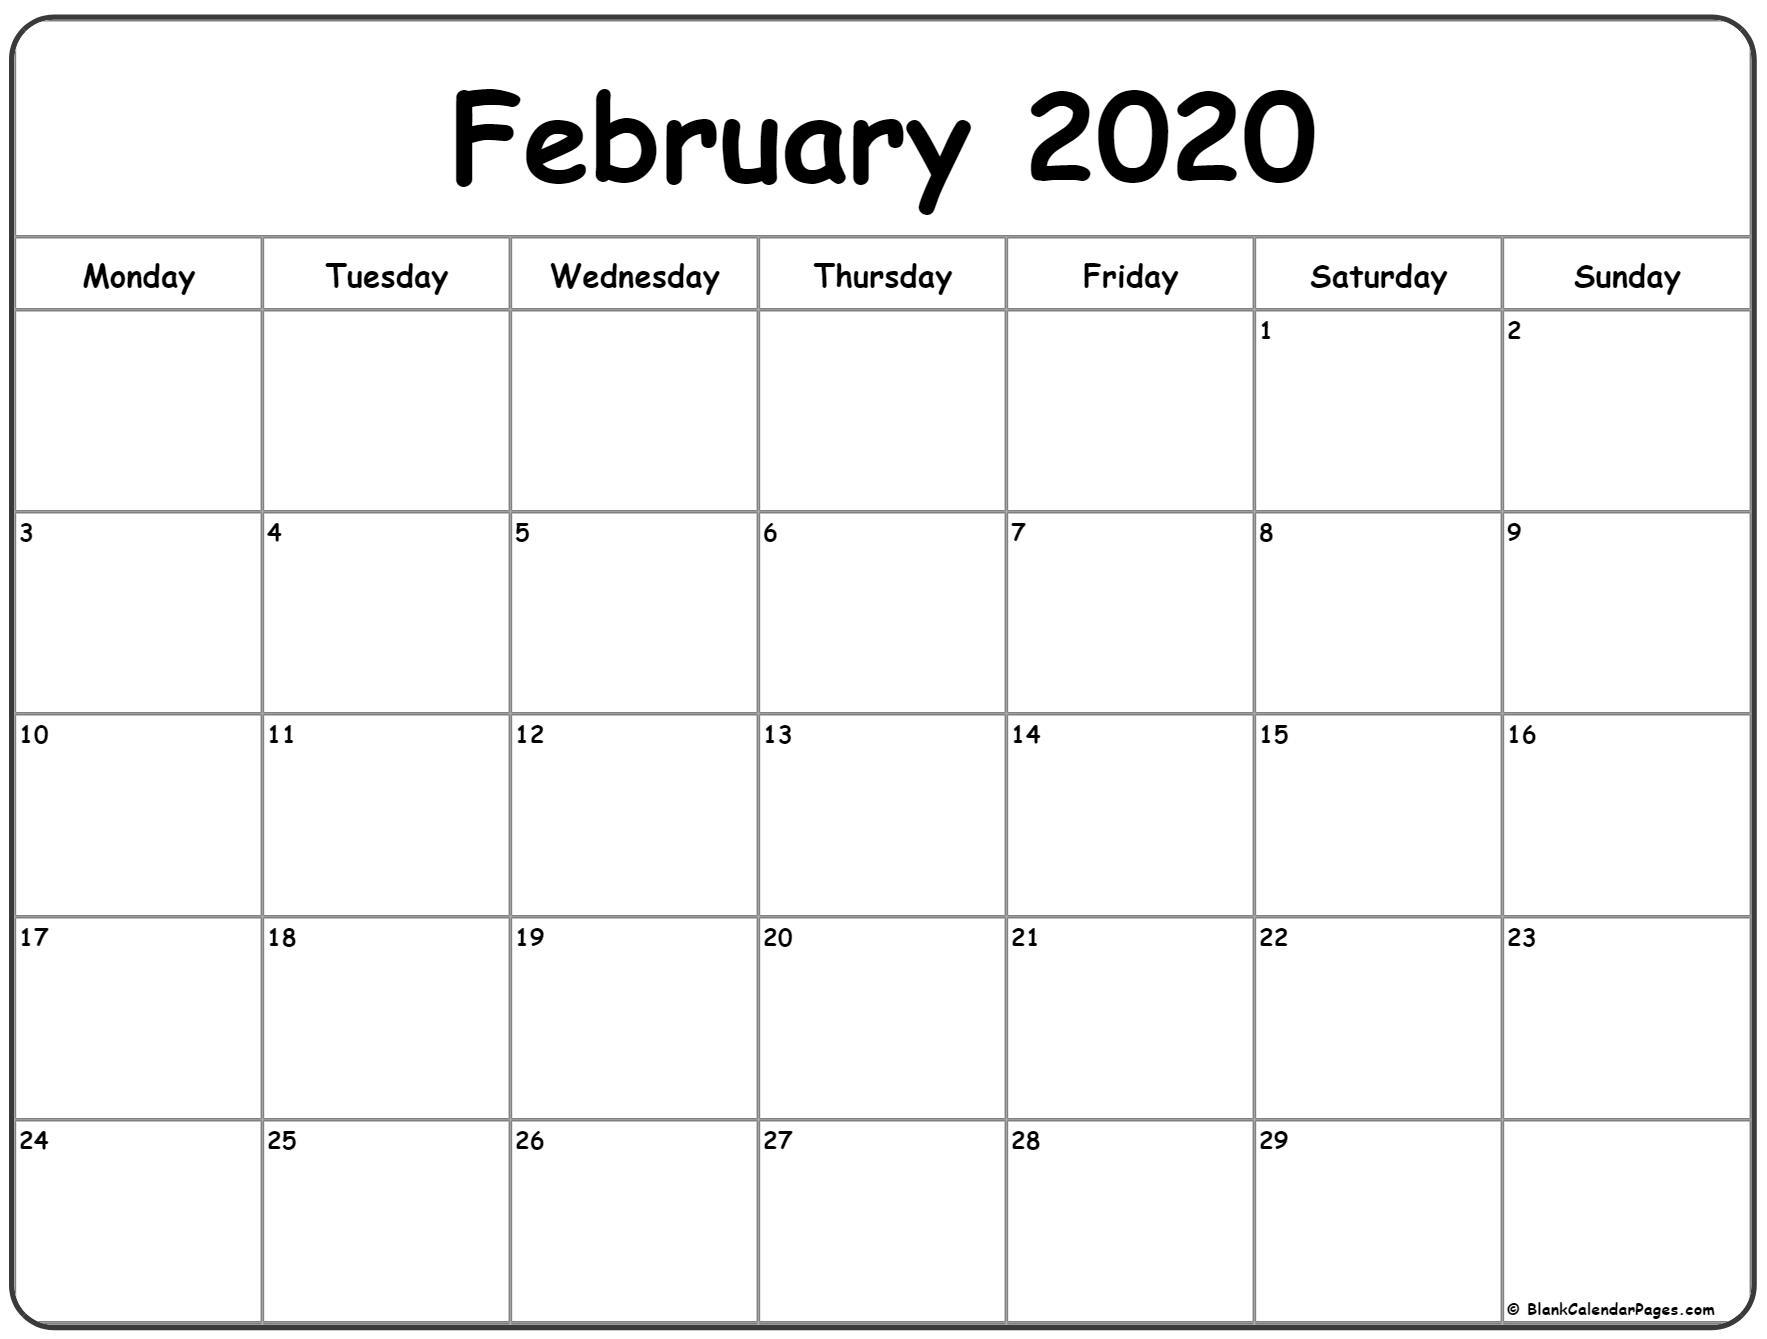 February 2020 Monday Calendar | Monday To Sunday with Monday Through Sunday Calendar Template